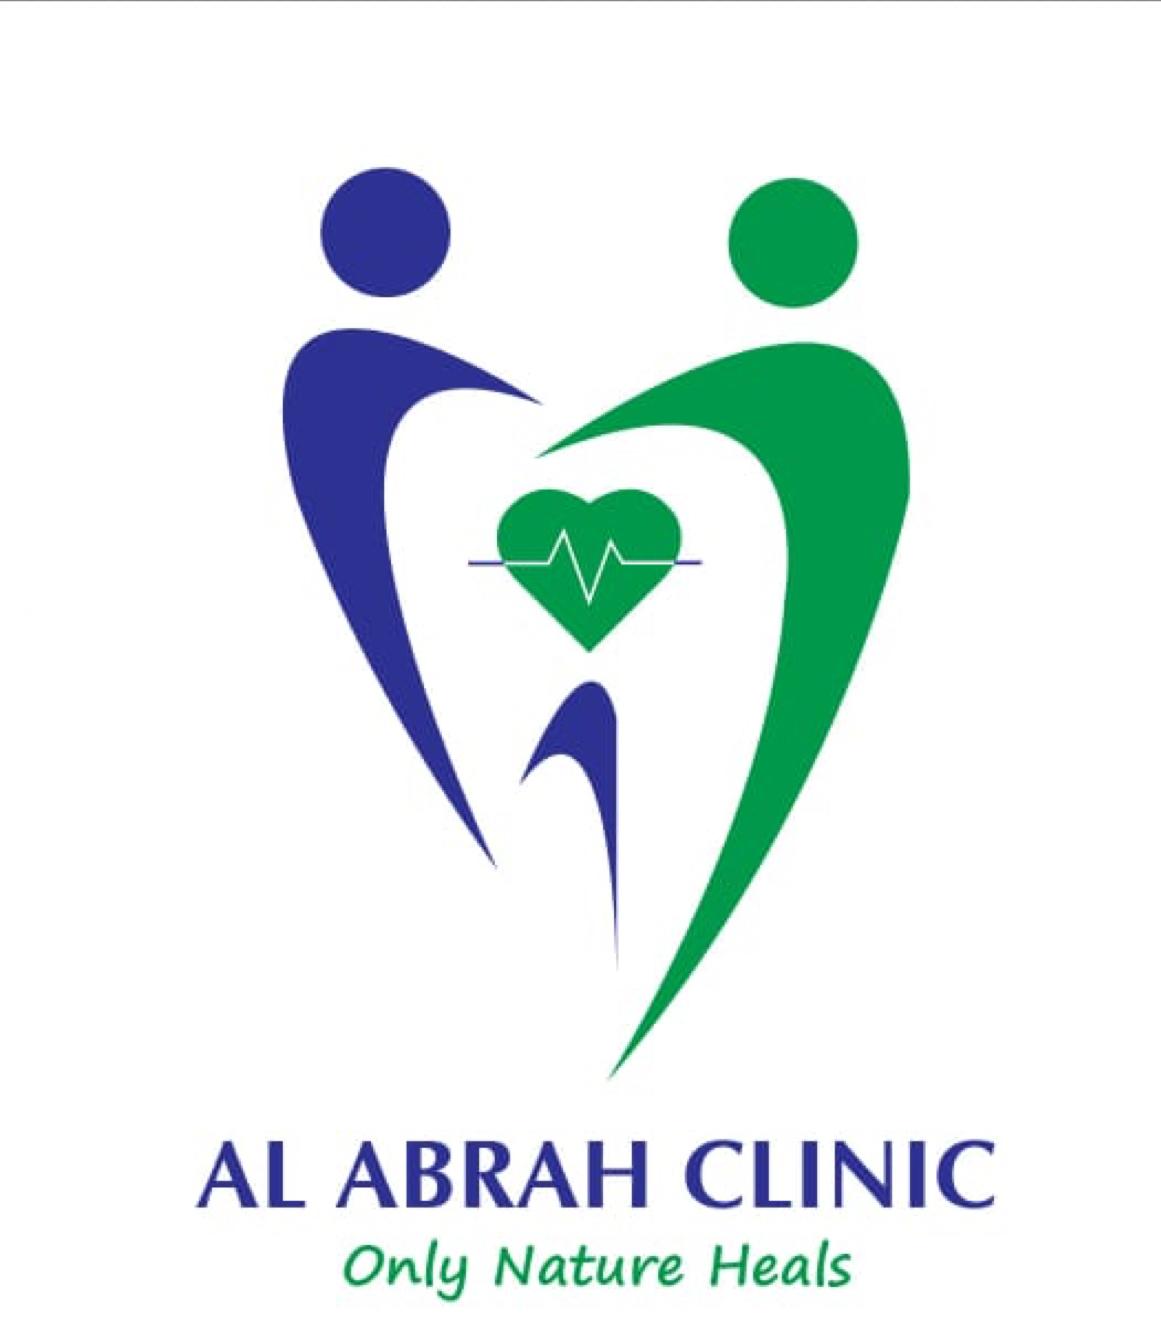 AbrahClinics